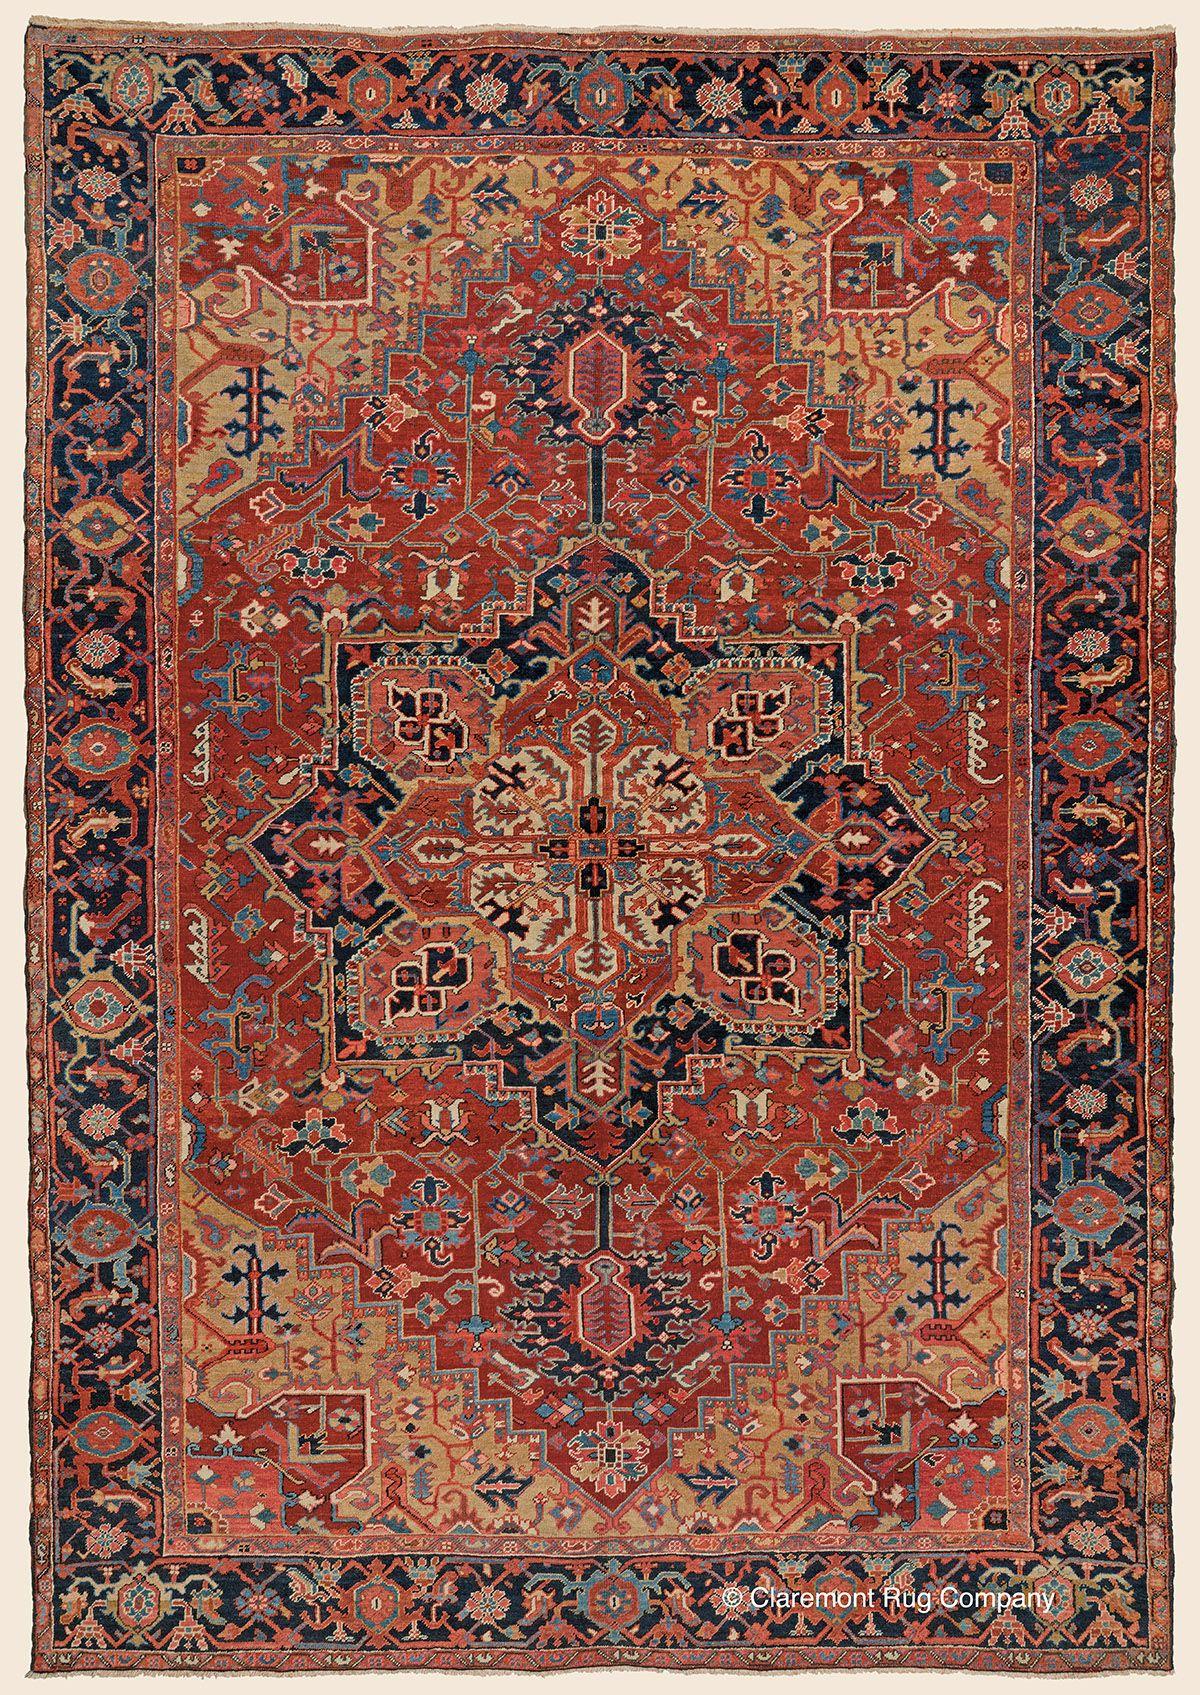 Heriz 8 5 X 12 0 Circa 1910 Price 17 000 Northwest Persian Antique Rug Claremont Company